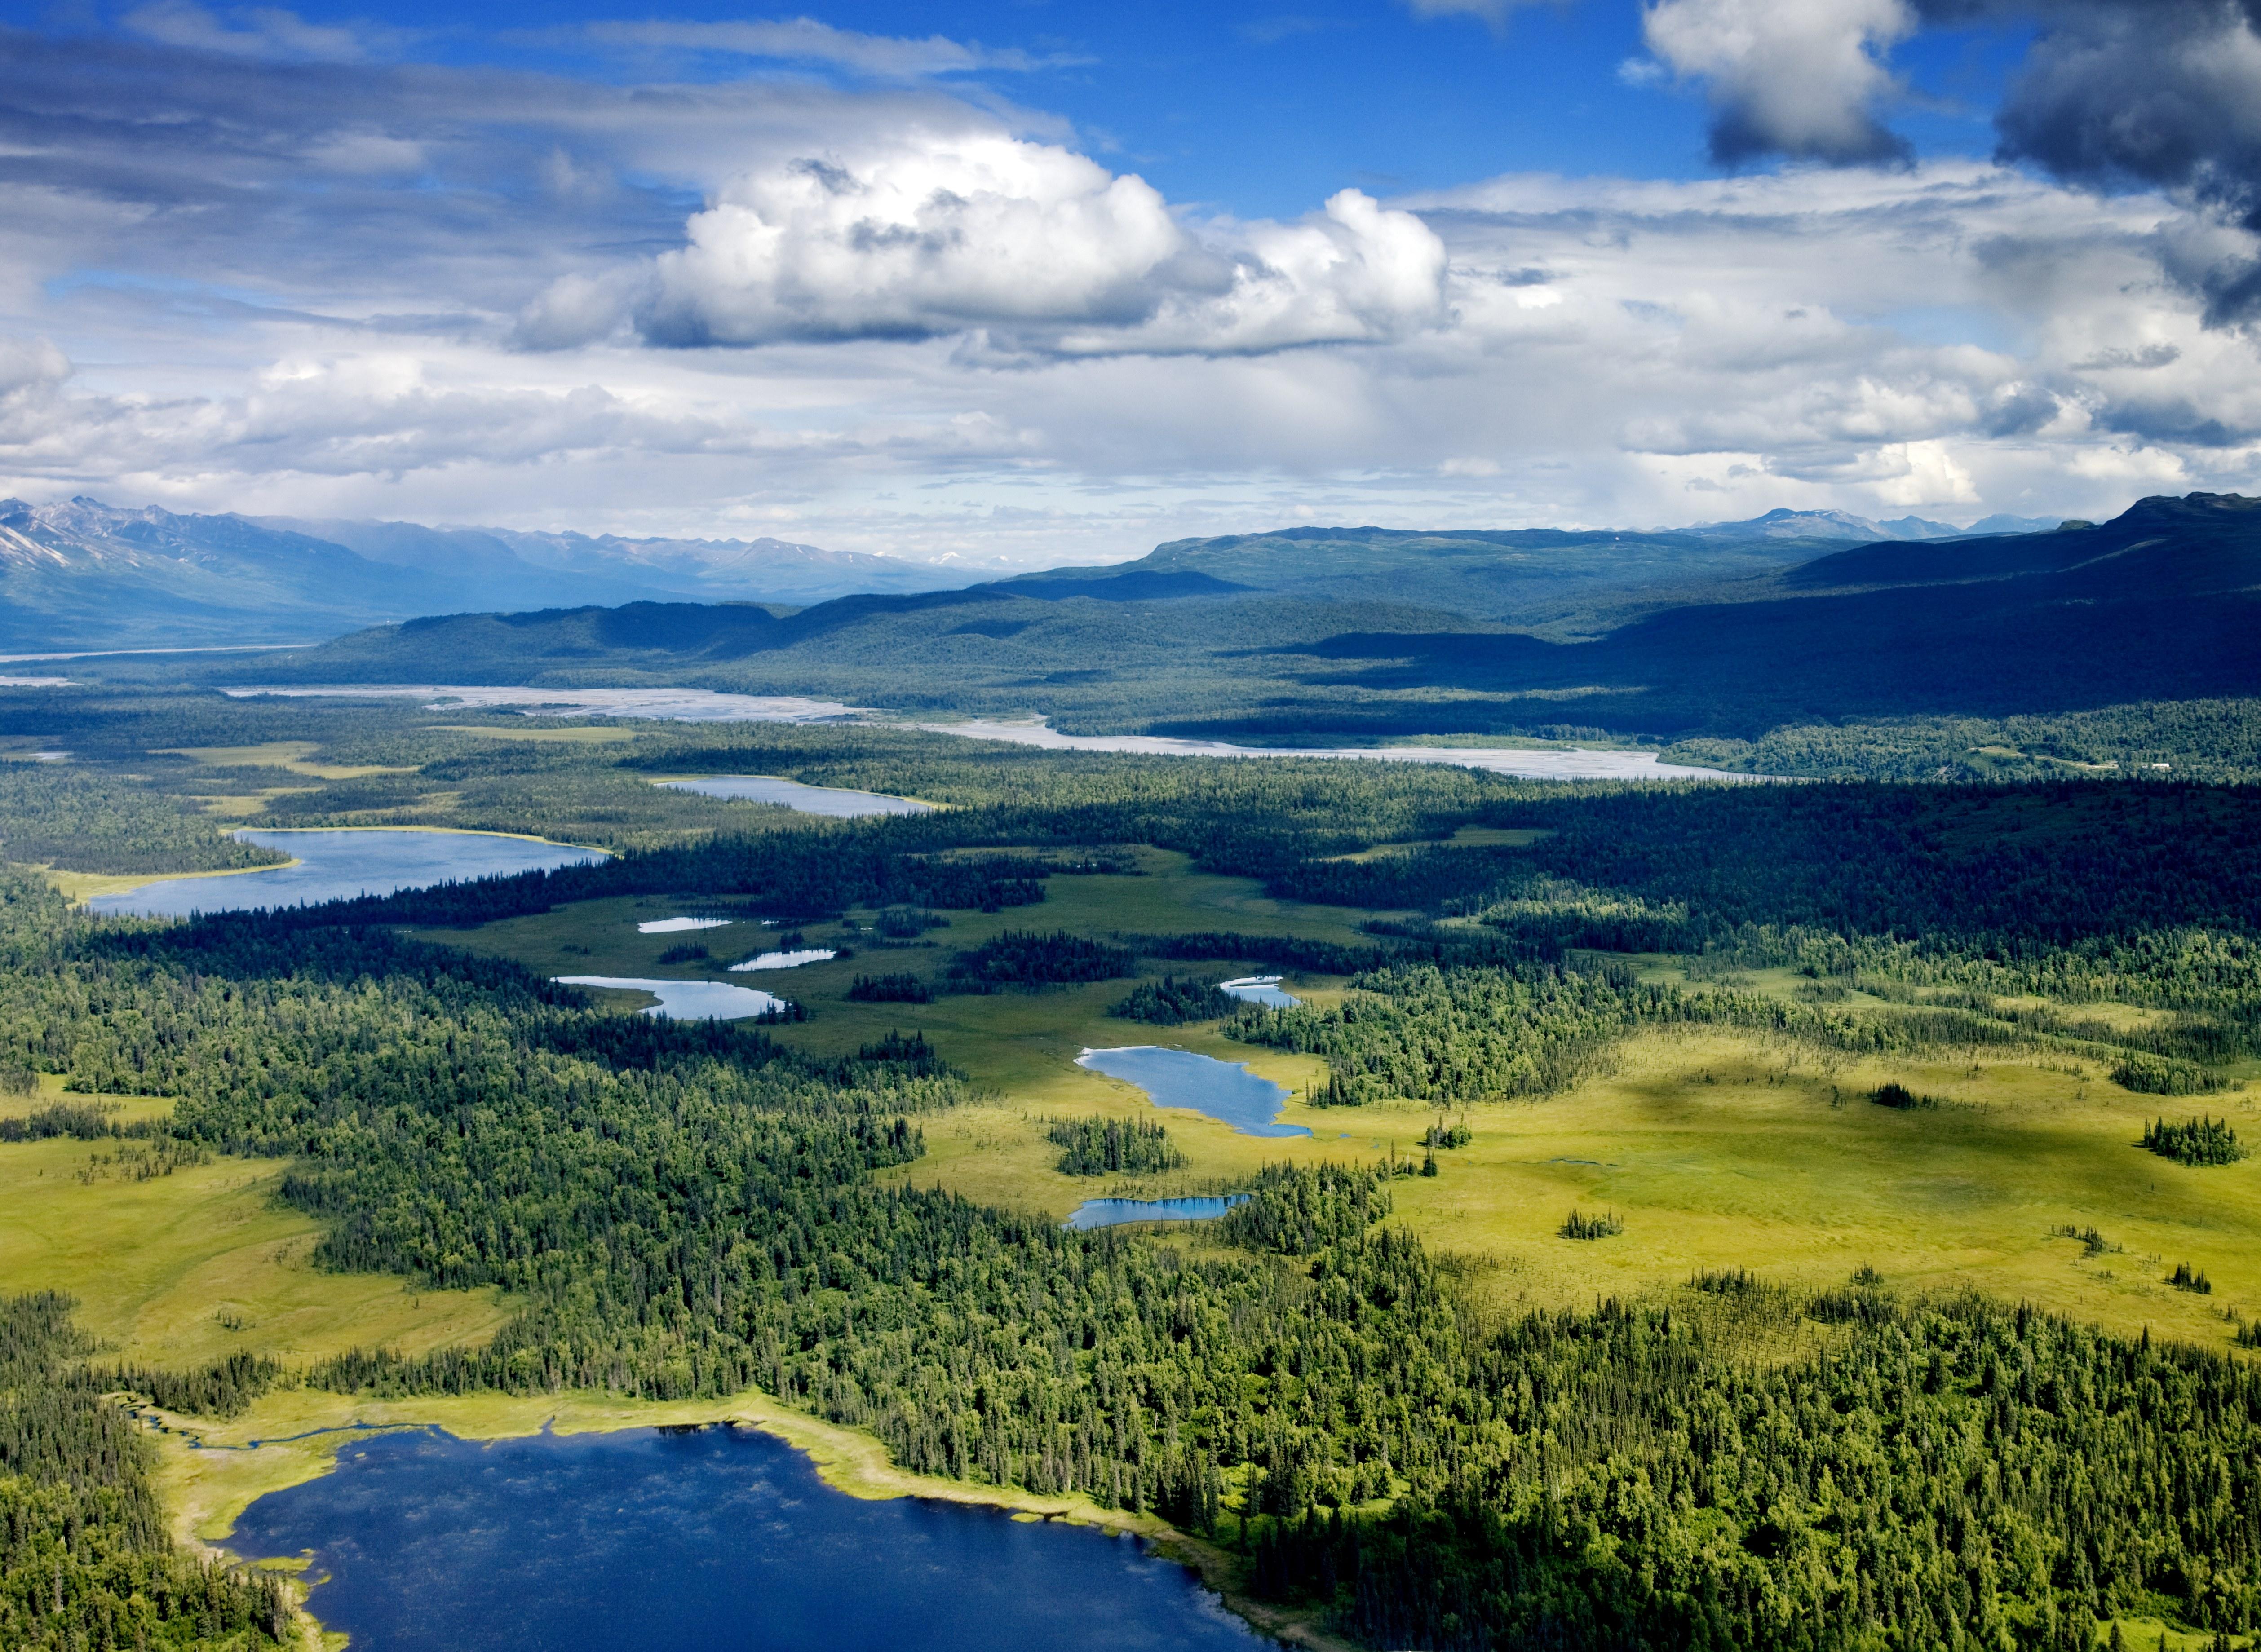 Willow Lake and Mount Wrangell, Wrangell Saint Elias National Park, Alaska скачать